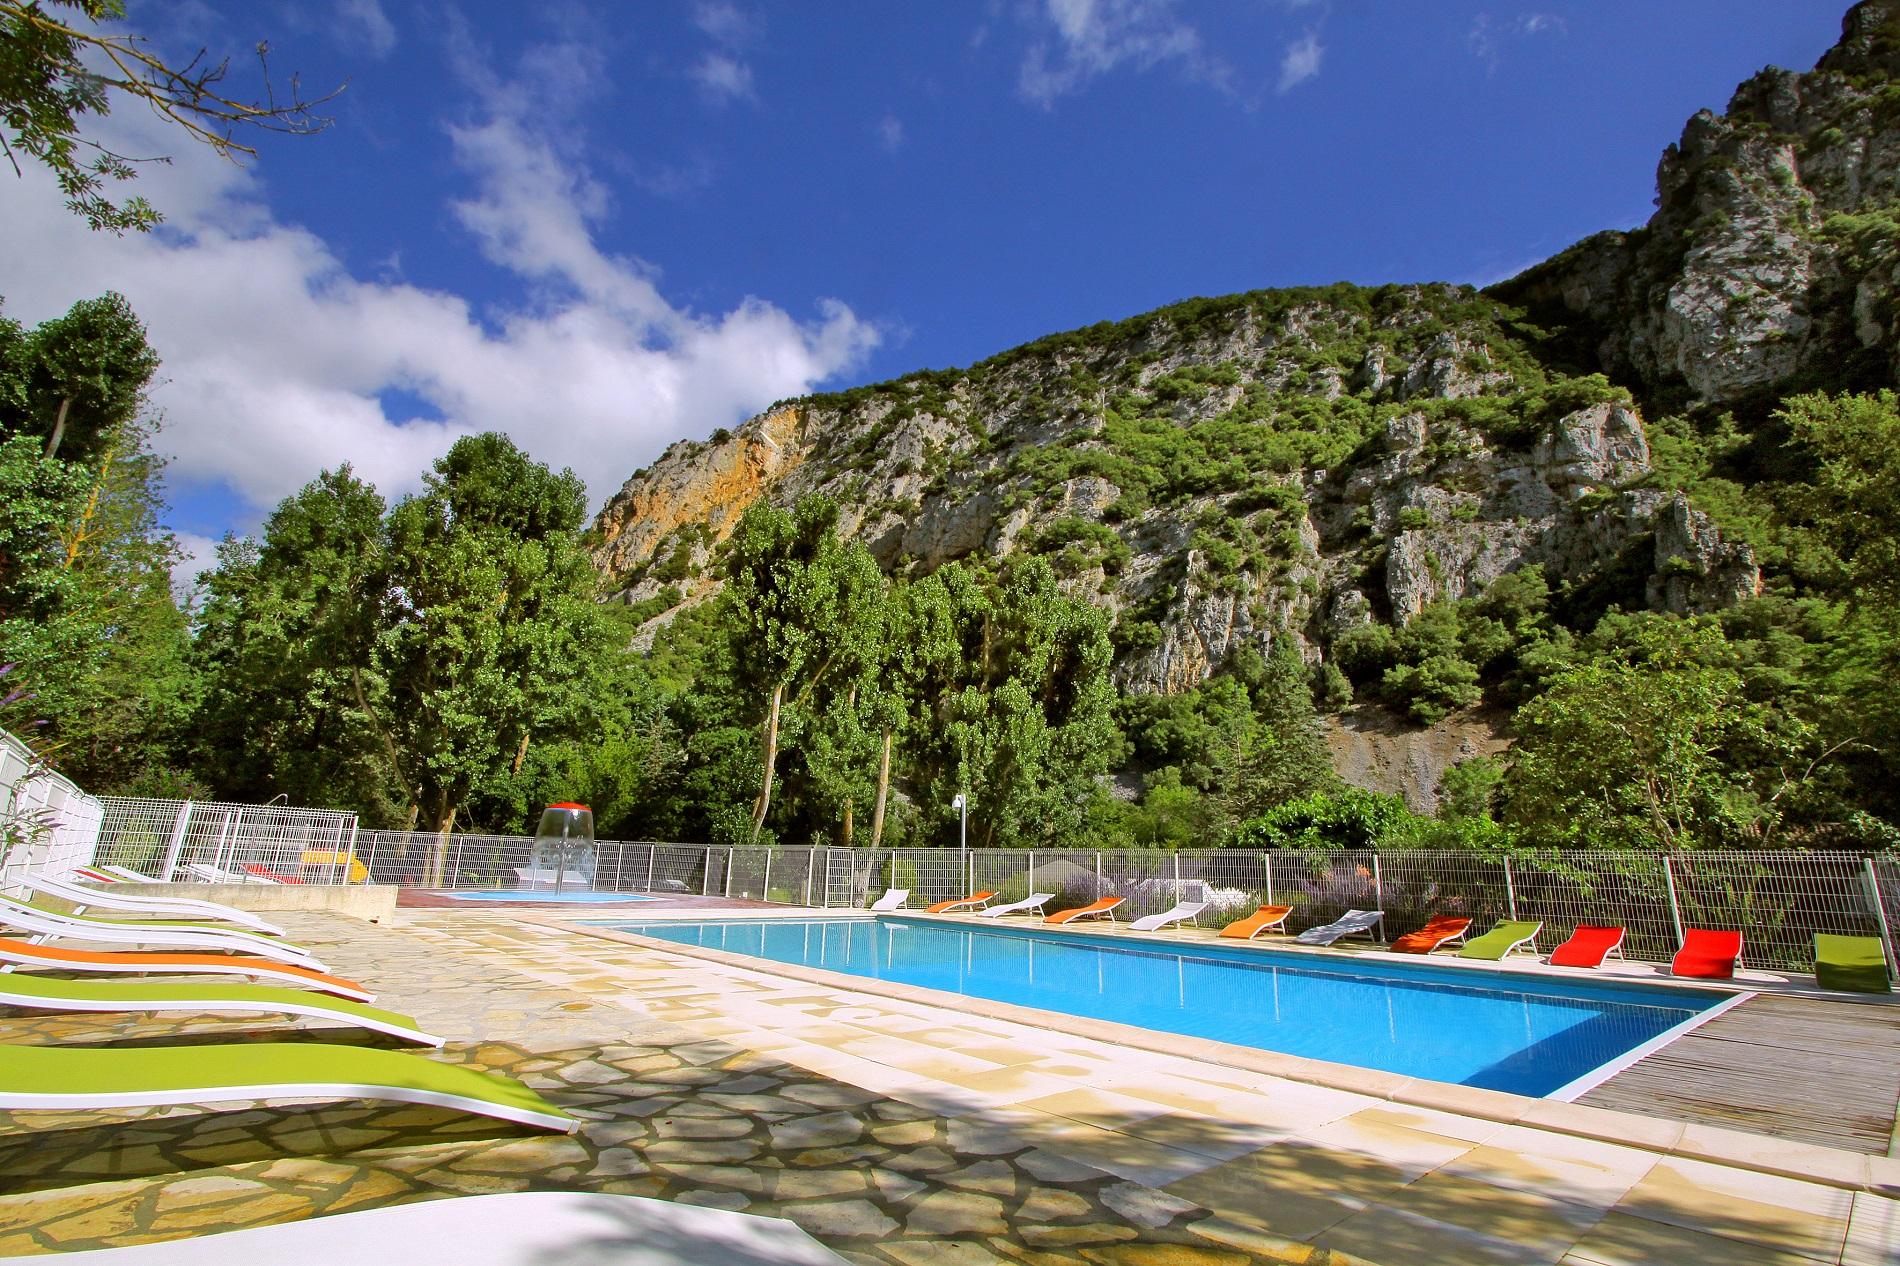 Camping Languedoc-Roussillon Bord De Mer - Camping Aude Midi ... tout Camping Aude Avec Piscine